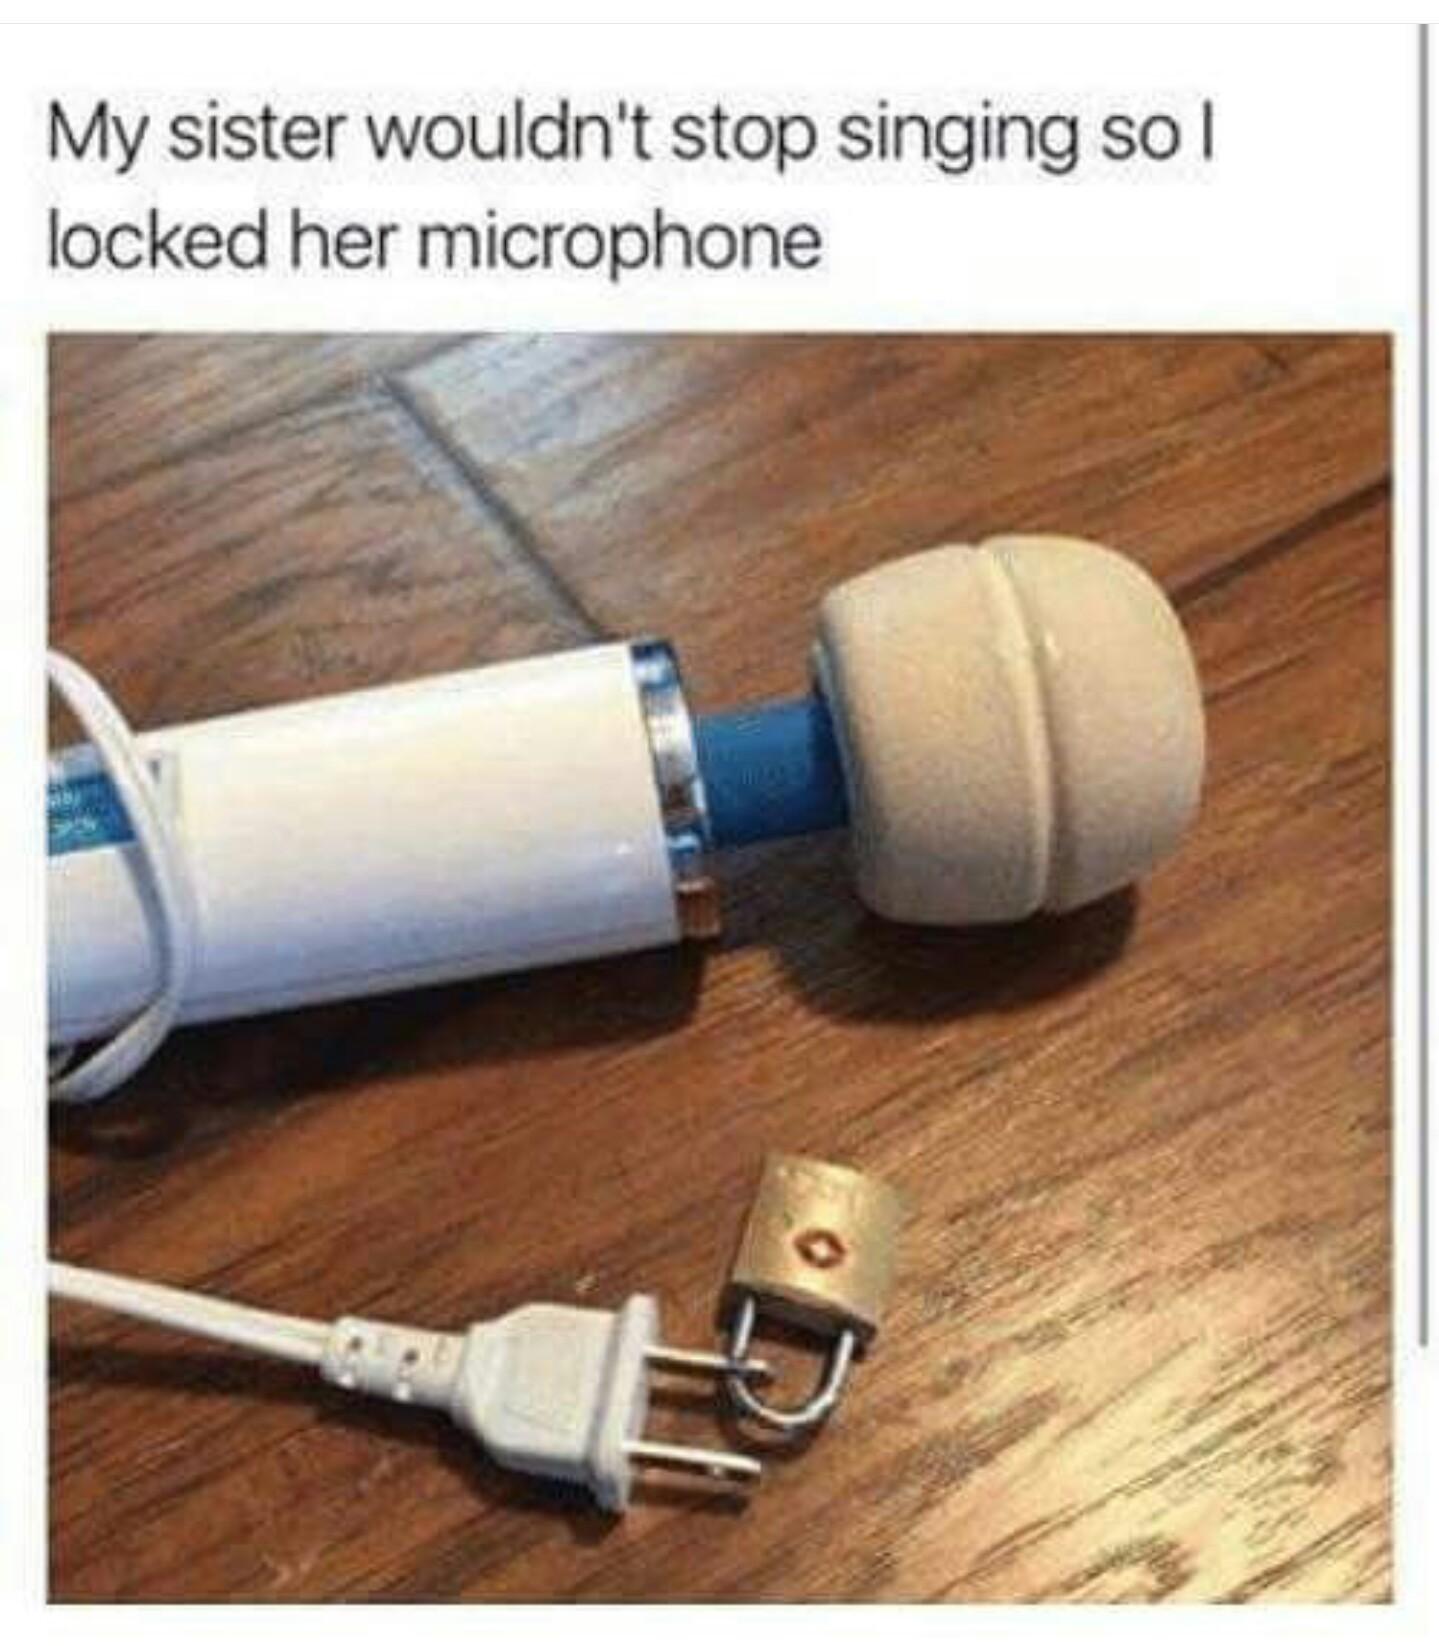 Not a mic